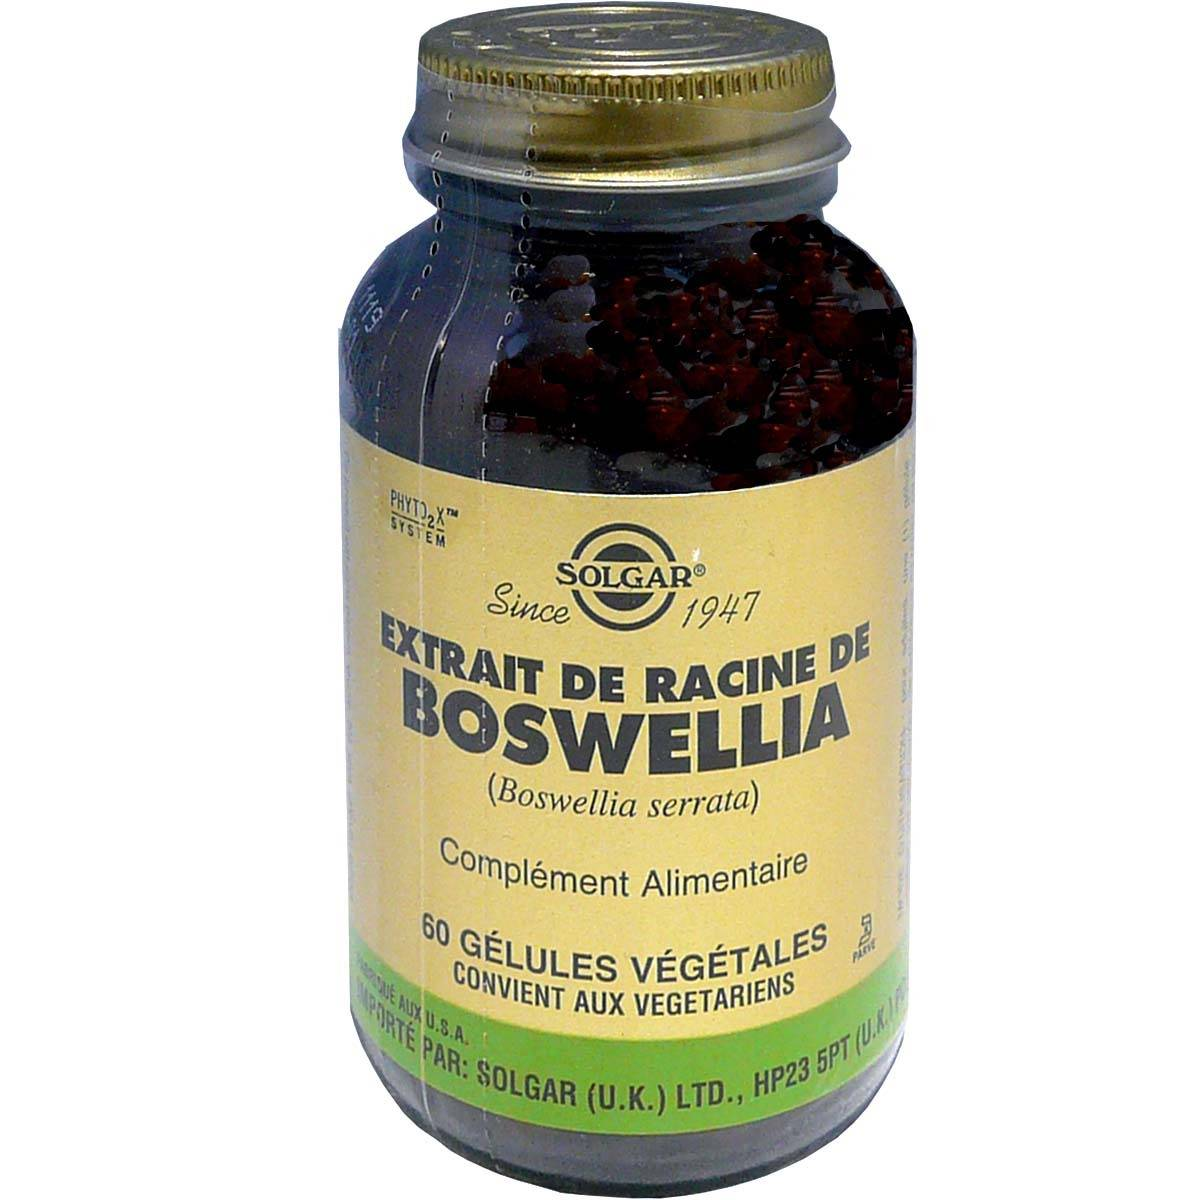 Solgar extrait de racine de boswellia 60 gelules